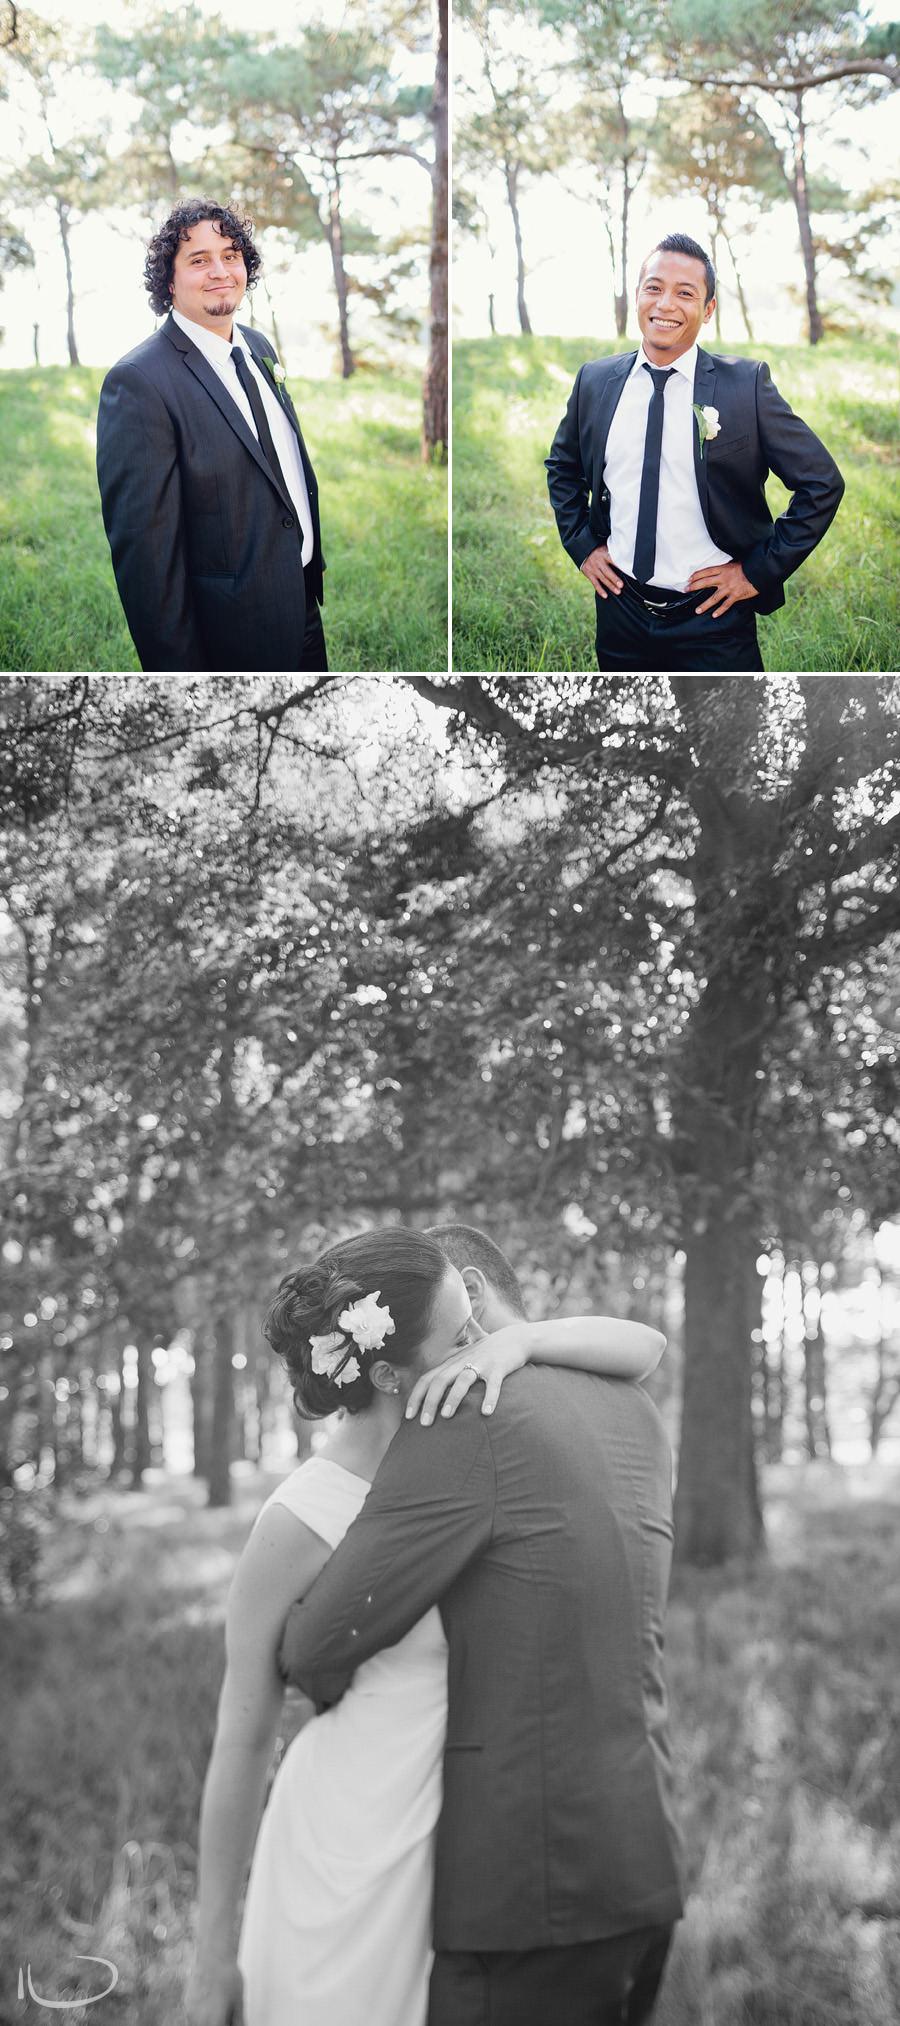 Centennial Park Wedding Photography: Groomsmen